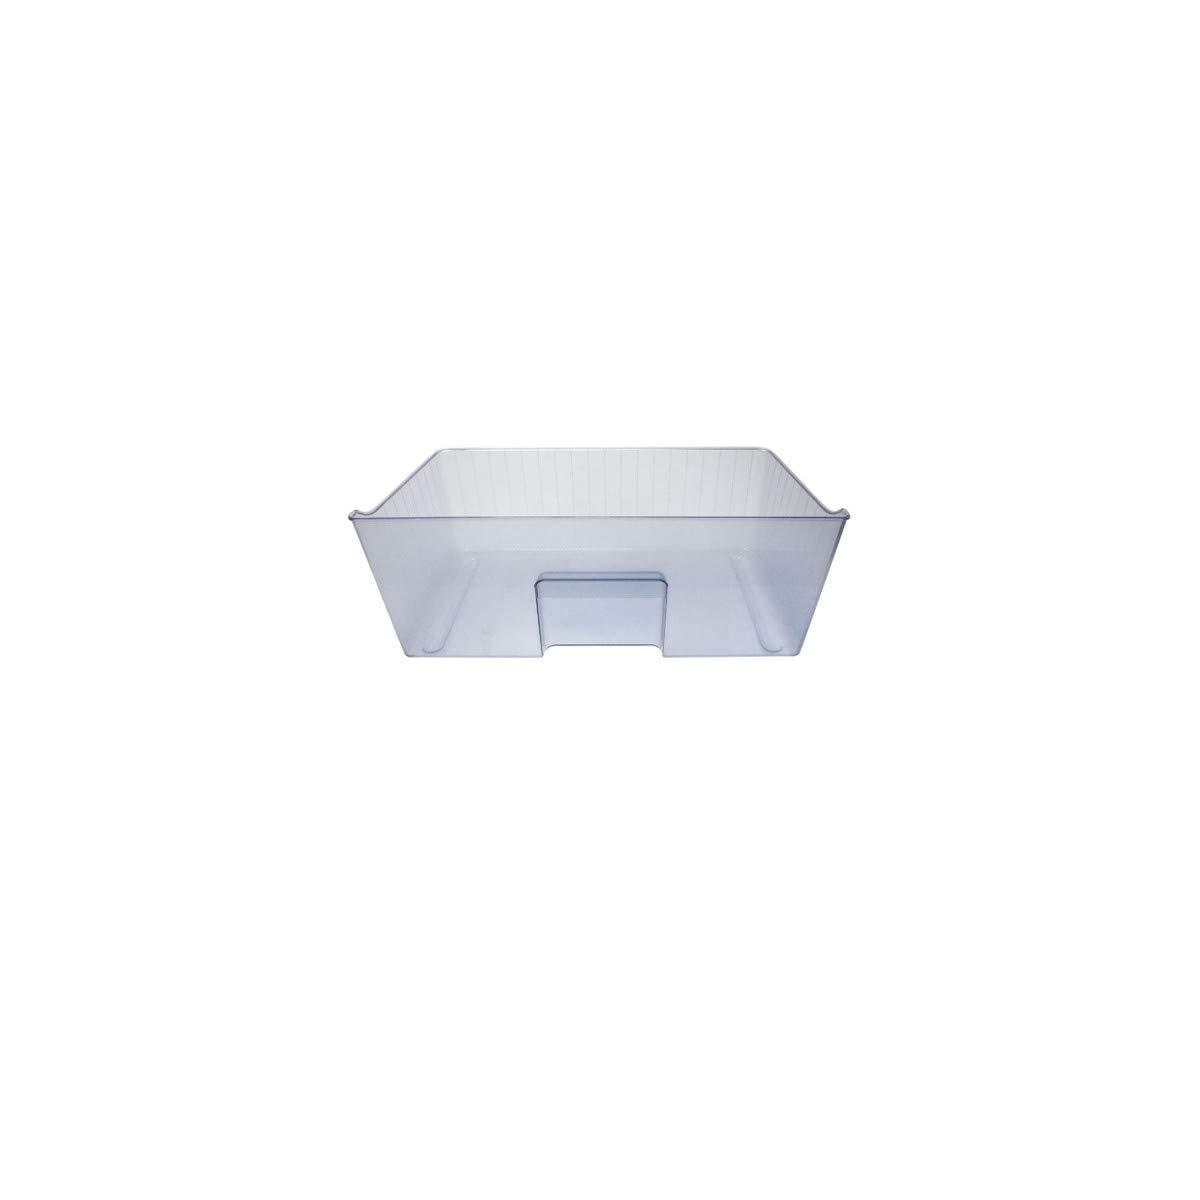 Recamania Cajon Verduras frigorifico Bosch 434645: Amazon.es